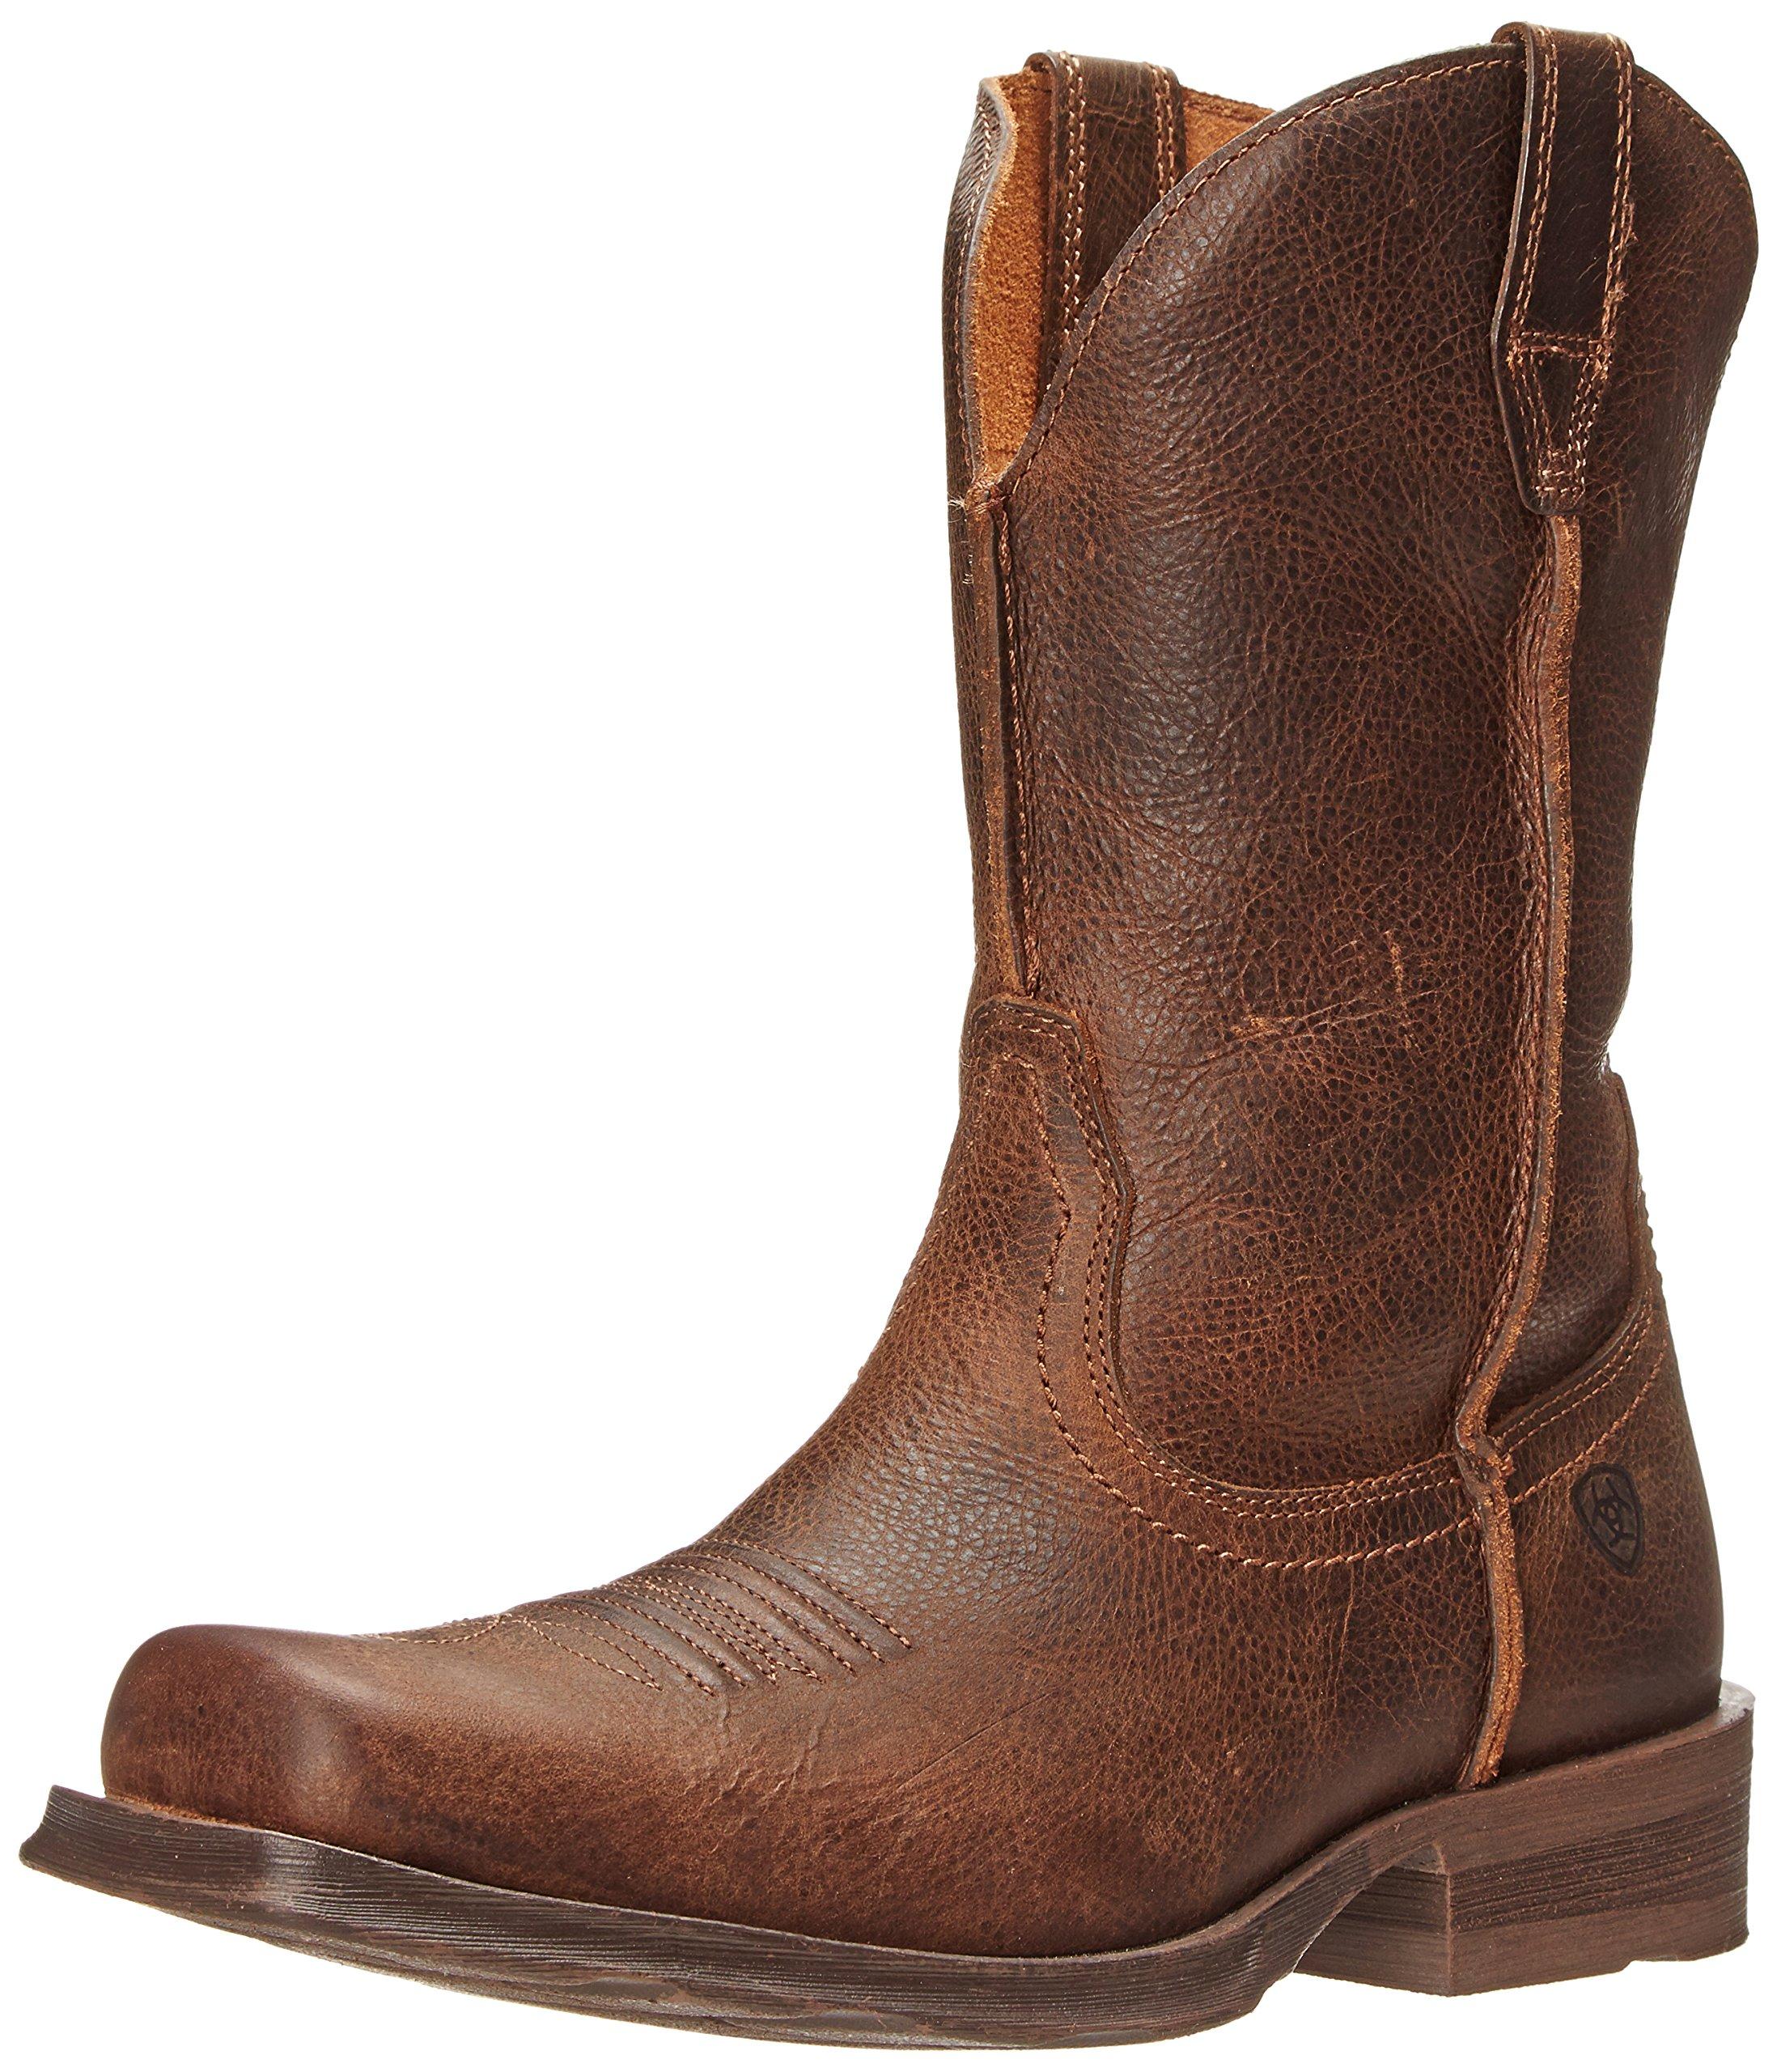 Ariat Men's Rambler Wide Square Toe Western Cowboy Boot, Wicker, 13 2E US